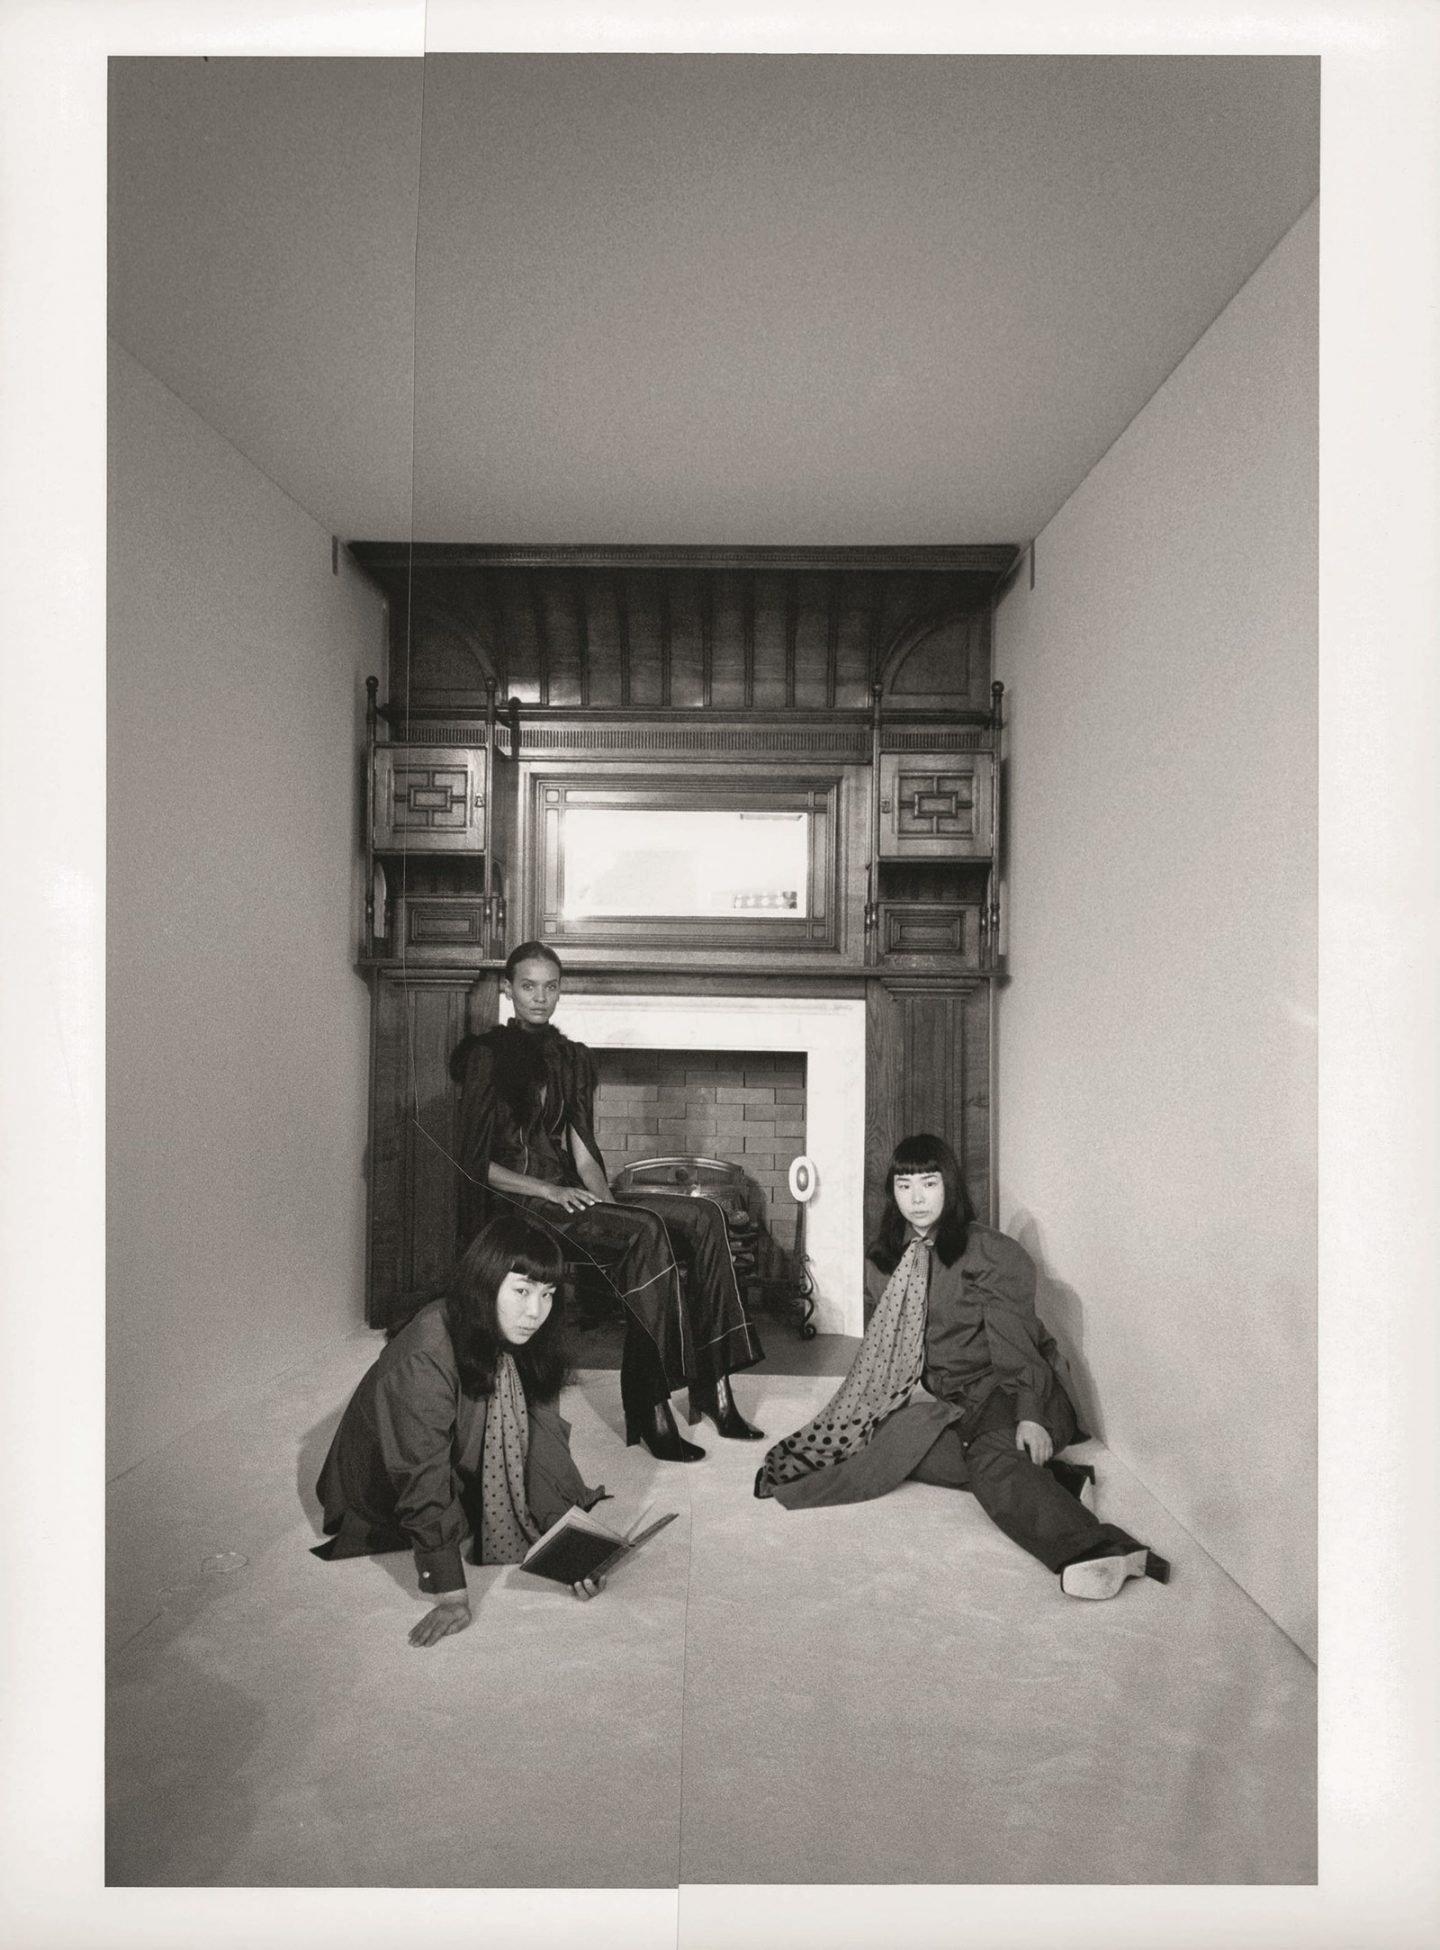 iGNANT-Design-Loewe-Fumiko-Imano-015